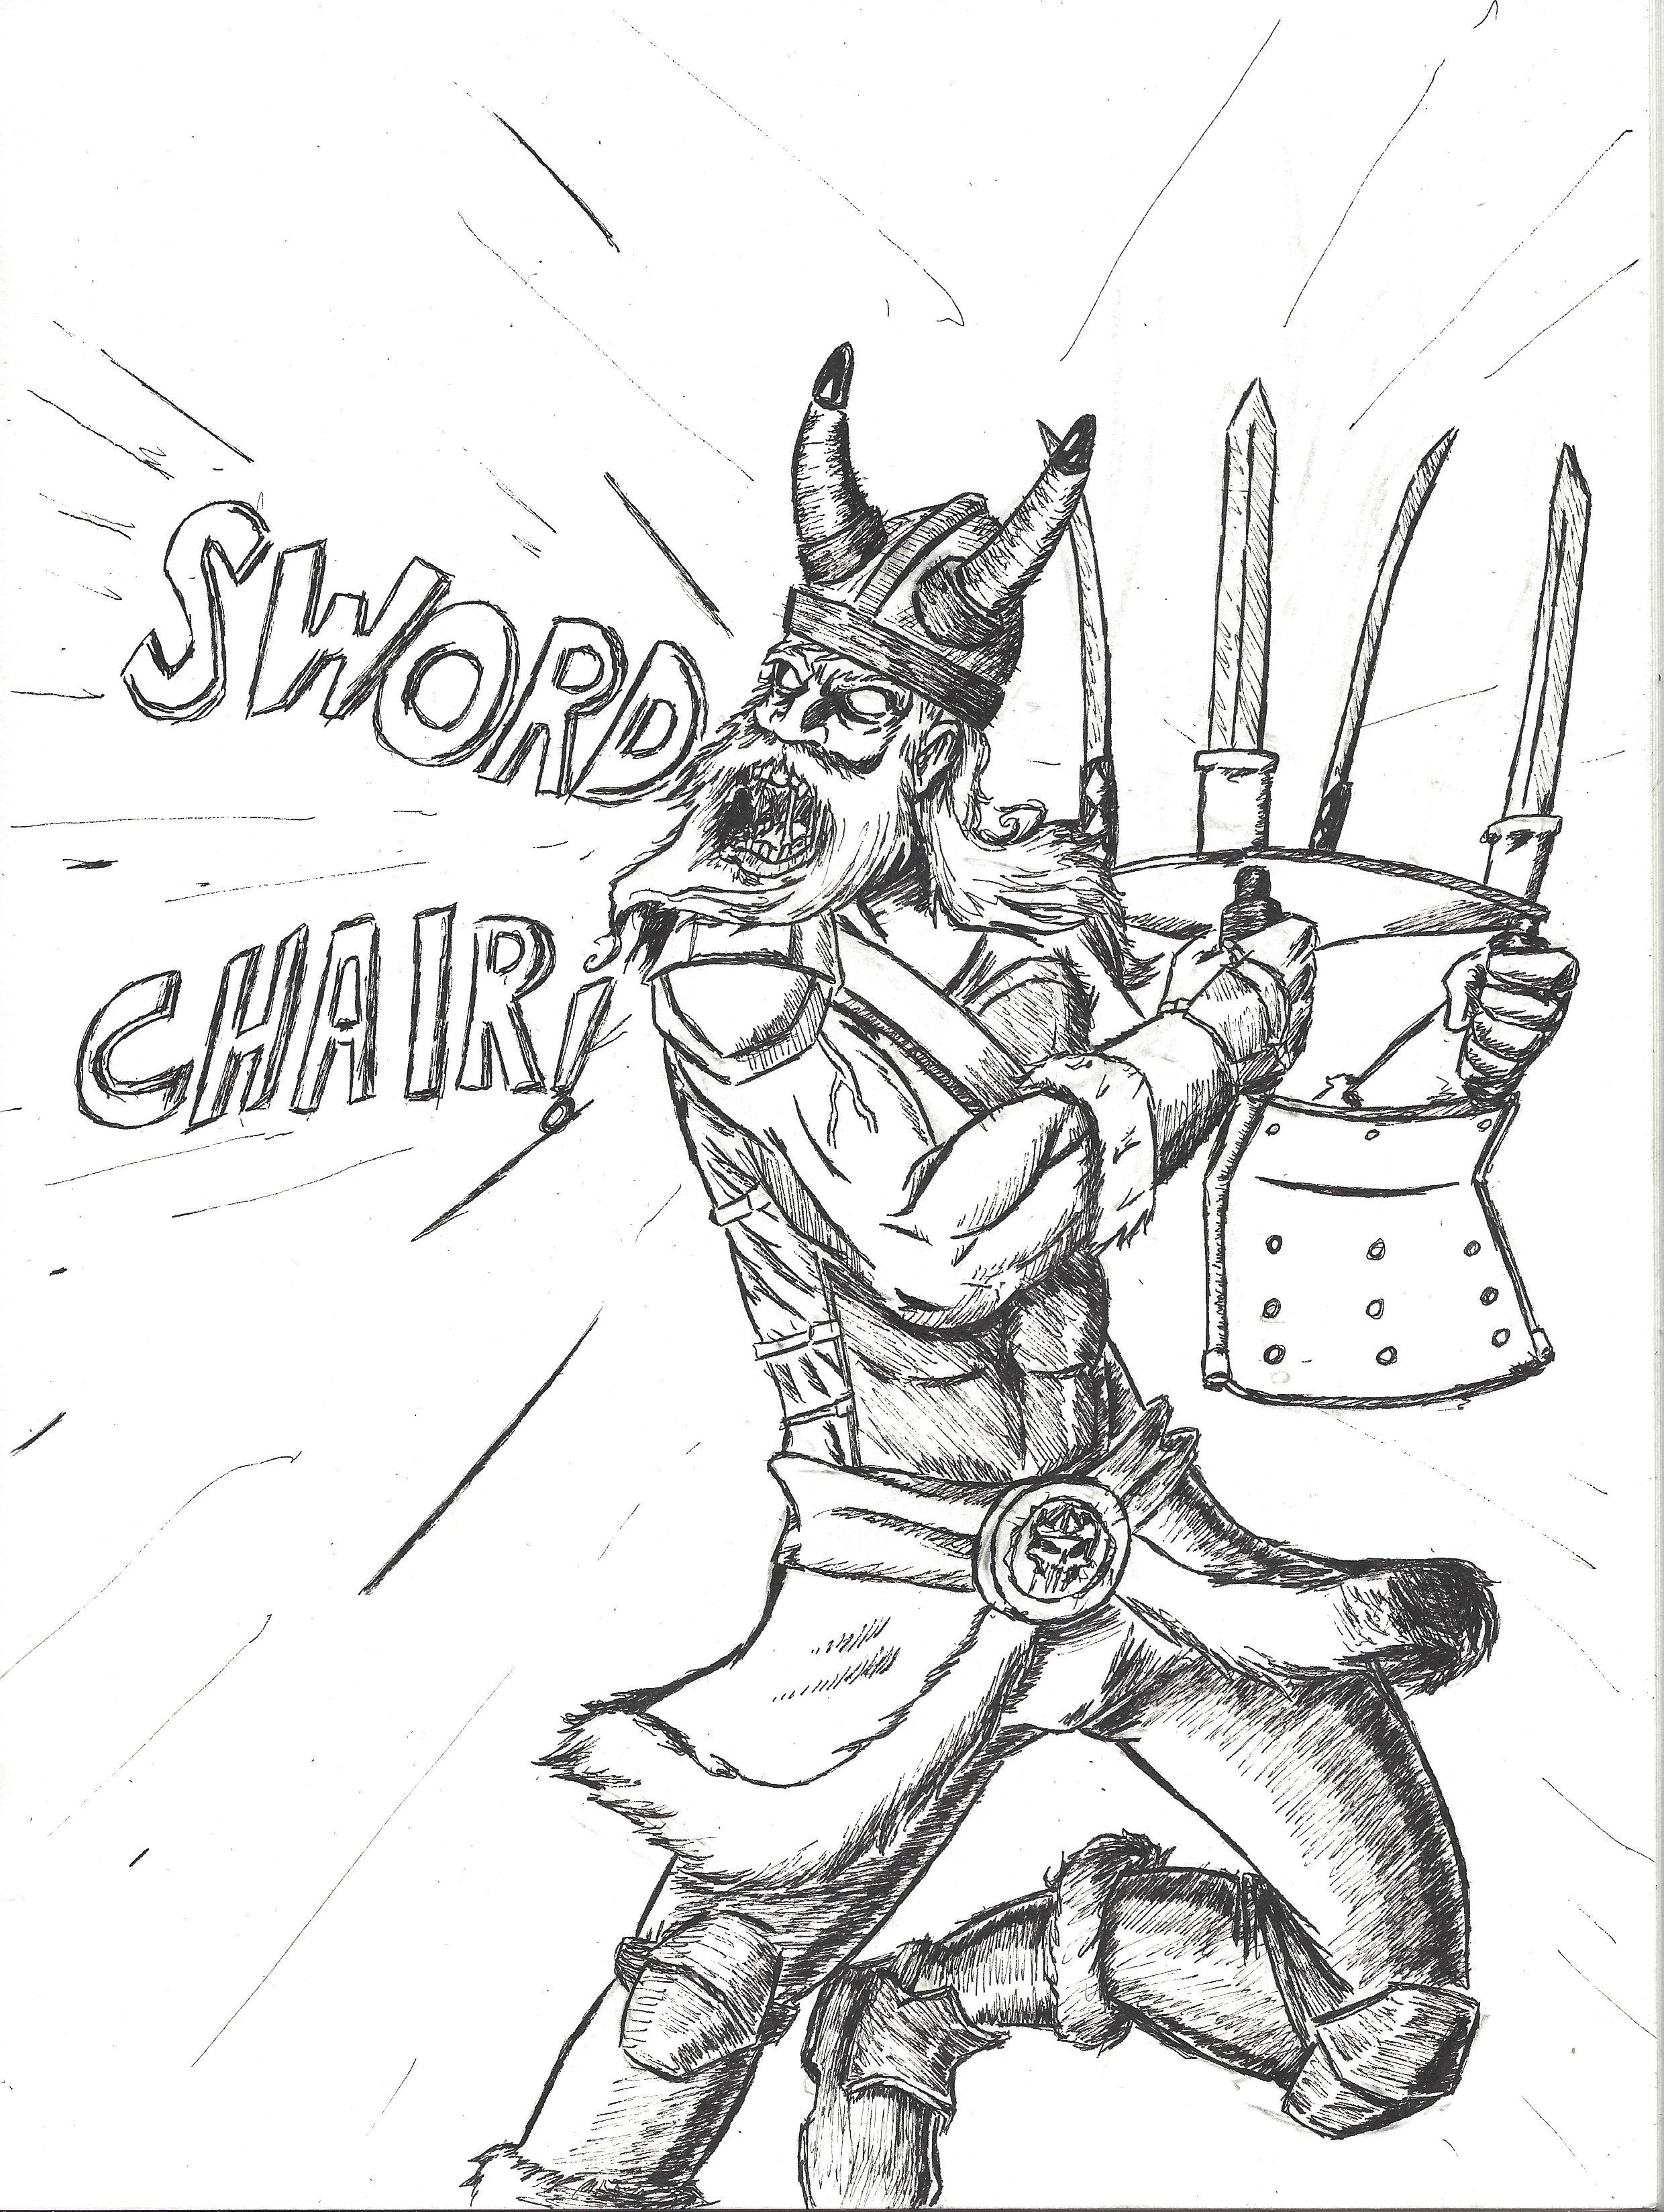 Sword Chair!?